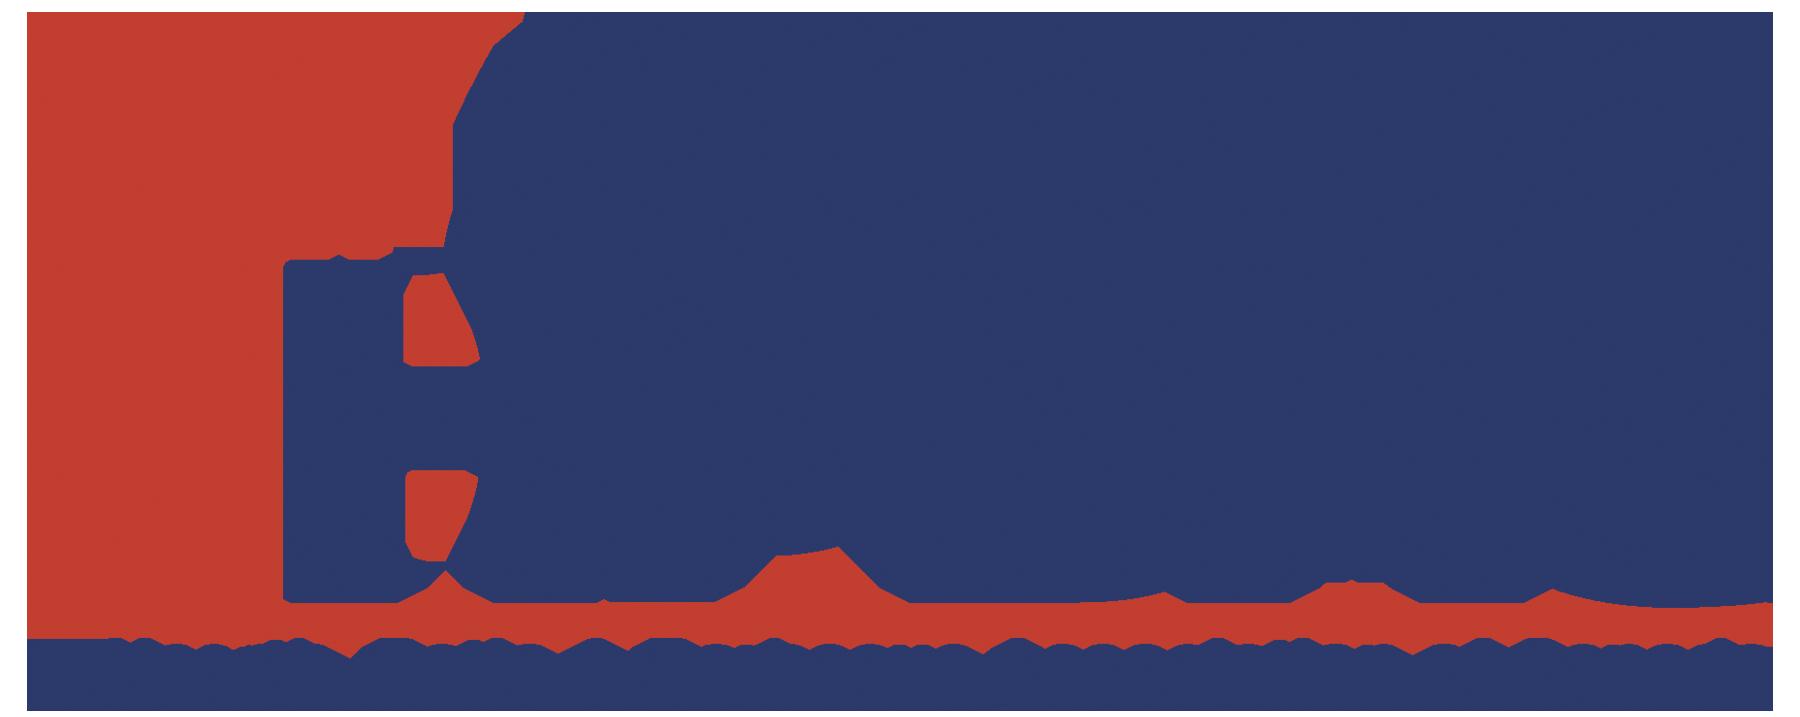 HPBAC Shop